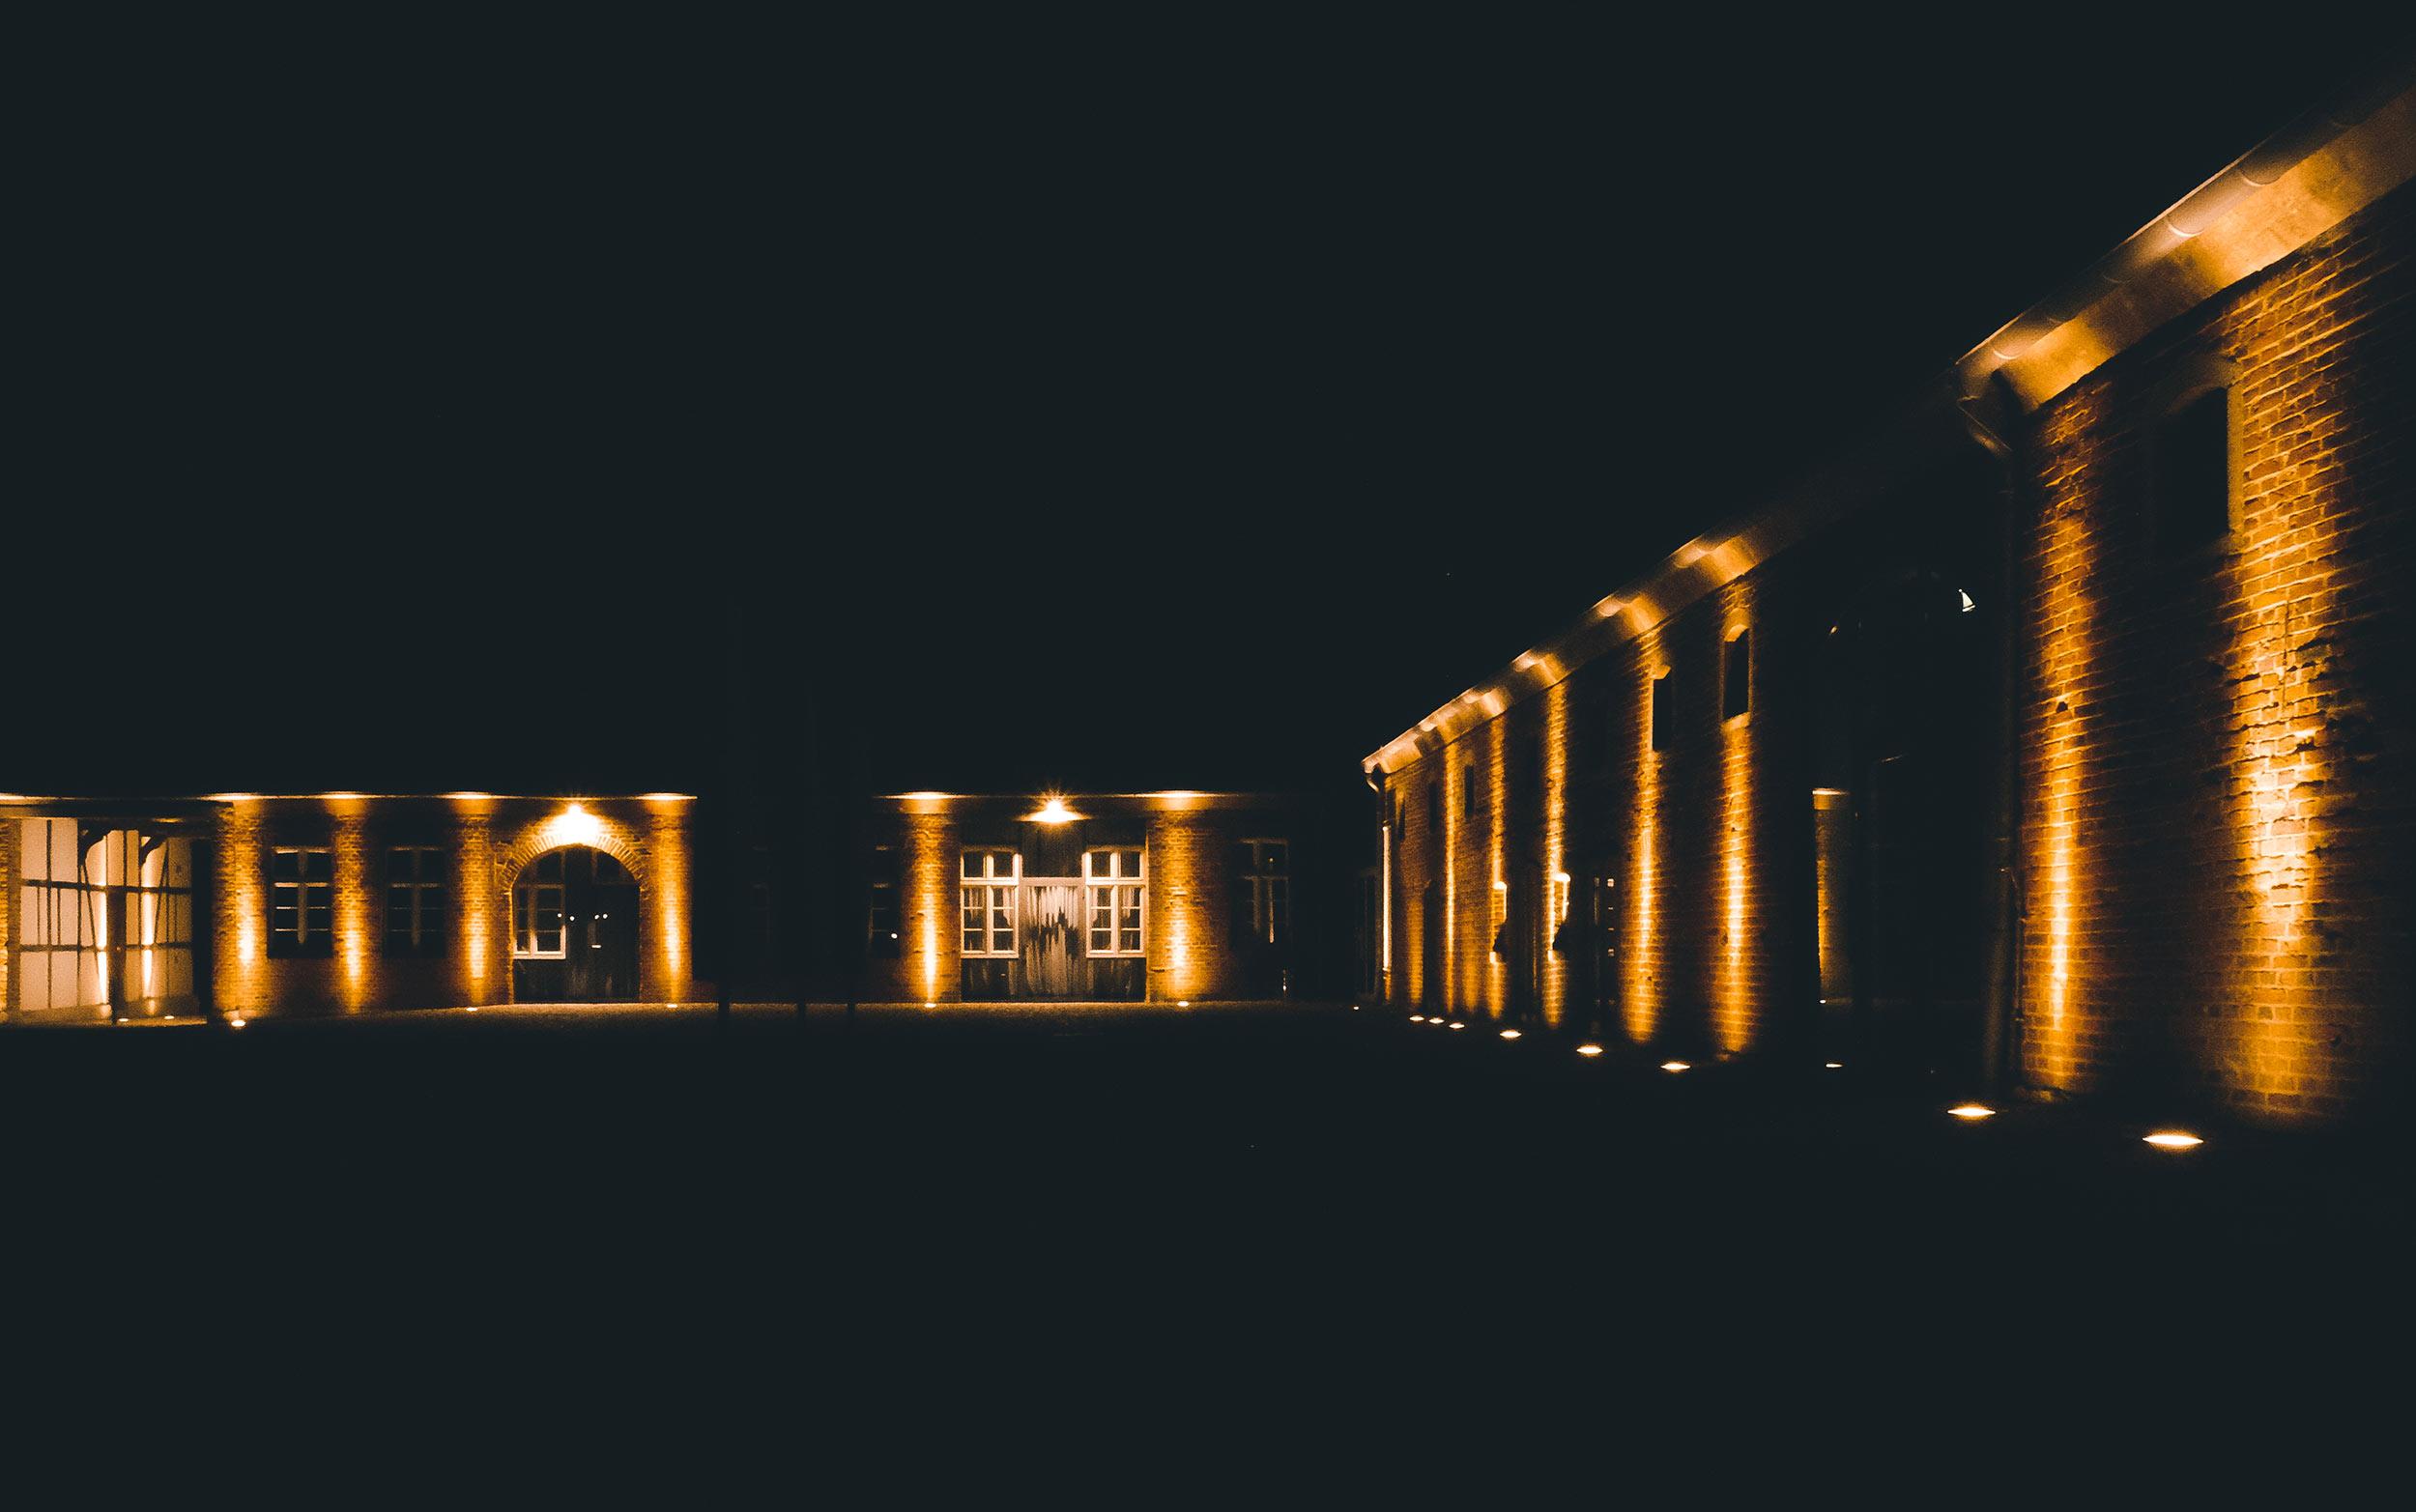 Kulturgut Haus Nottbeck - 3-Tagestour mit dem Camper im Münsterland